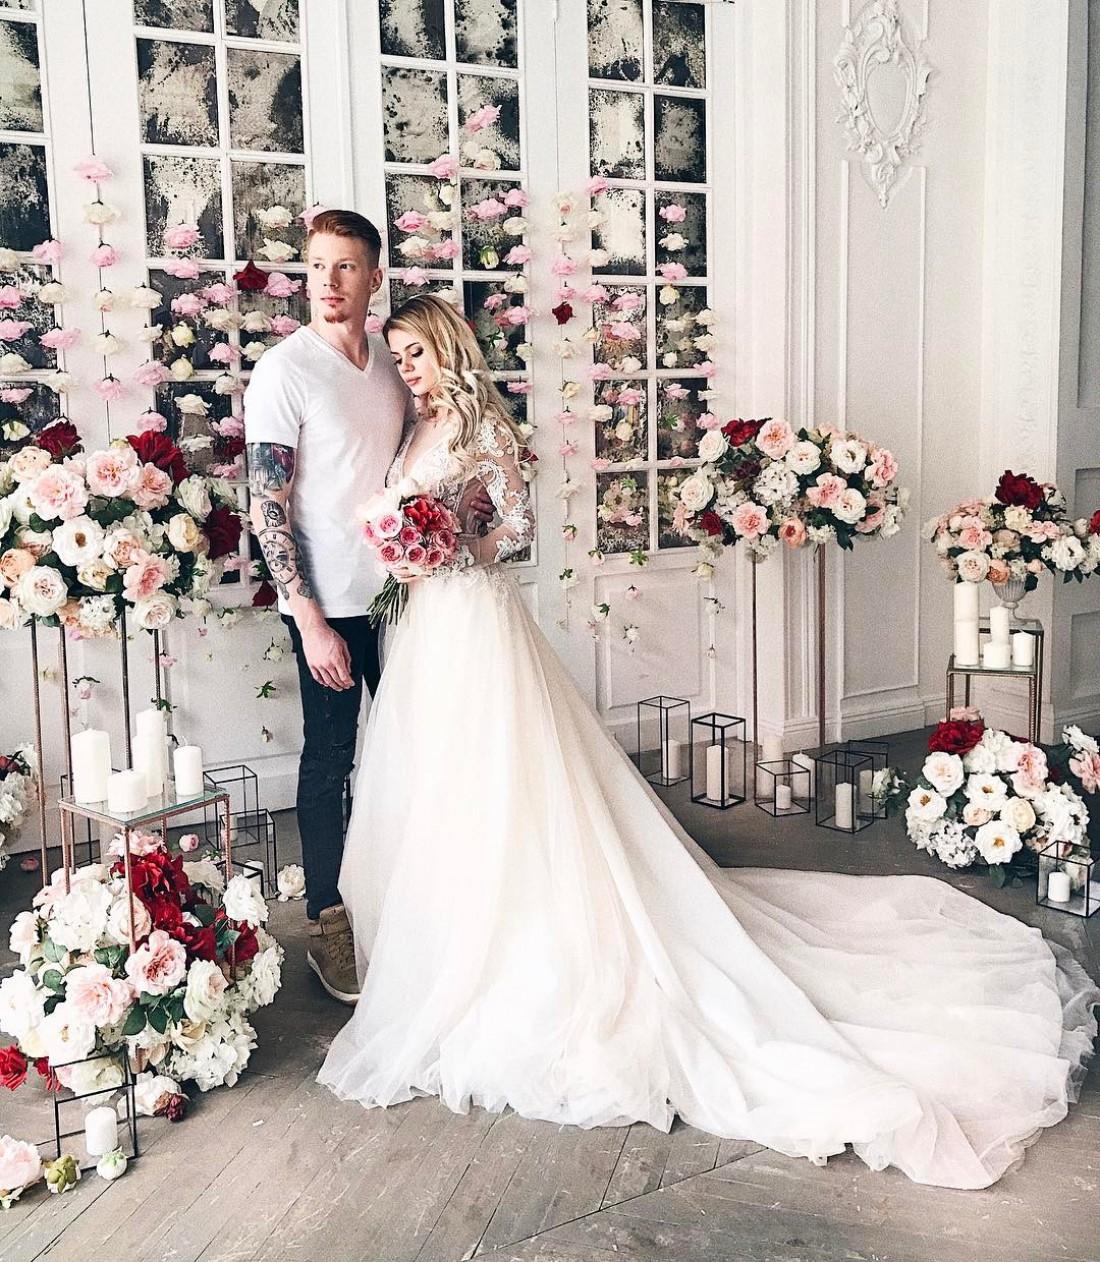 Фото невеста преснякова